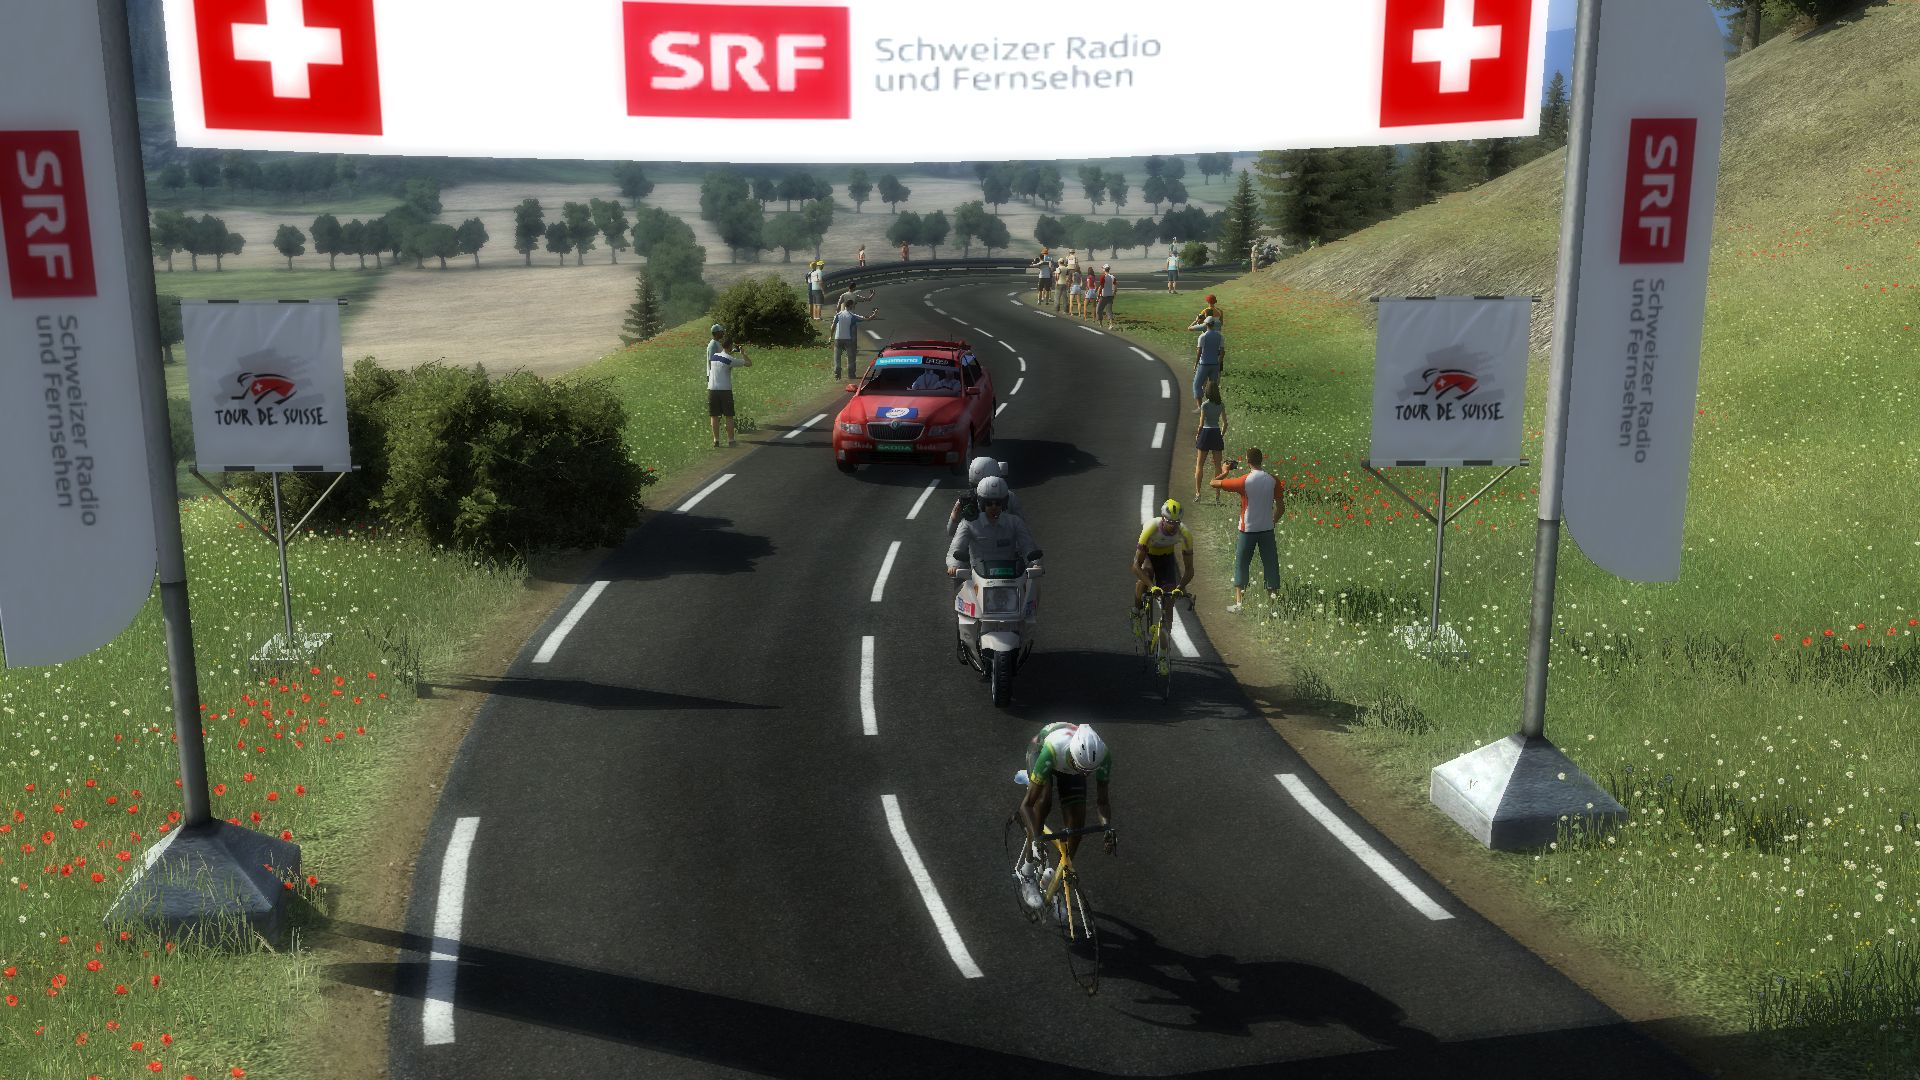 pcmdaily.com/images/mg/2017/Races/U23/Avenir/AVES7%2012.jpg